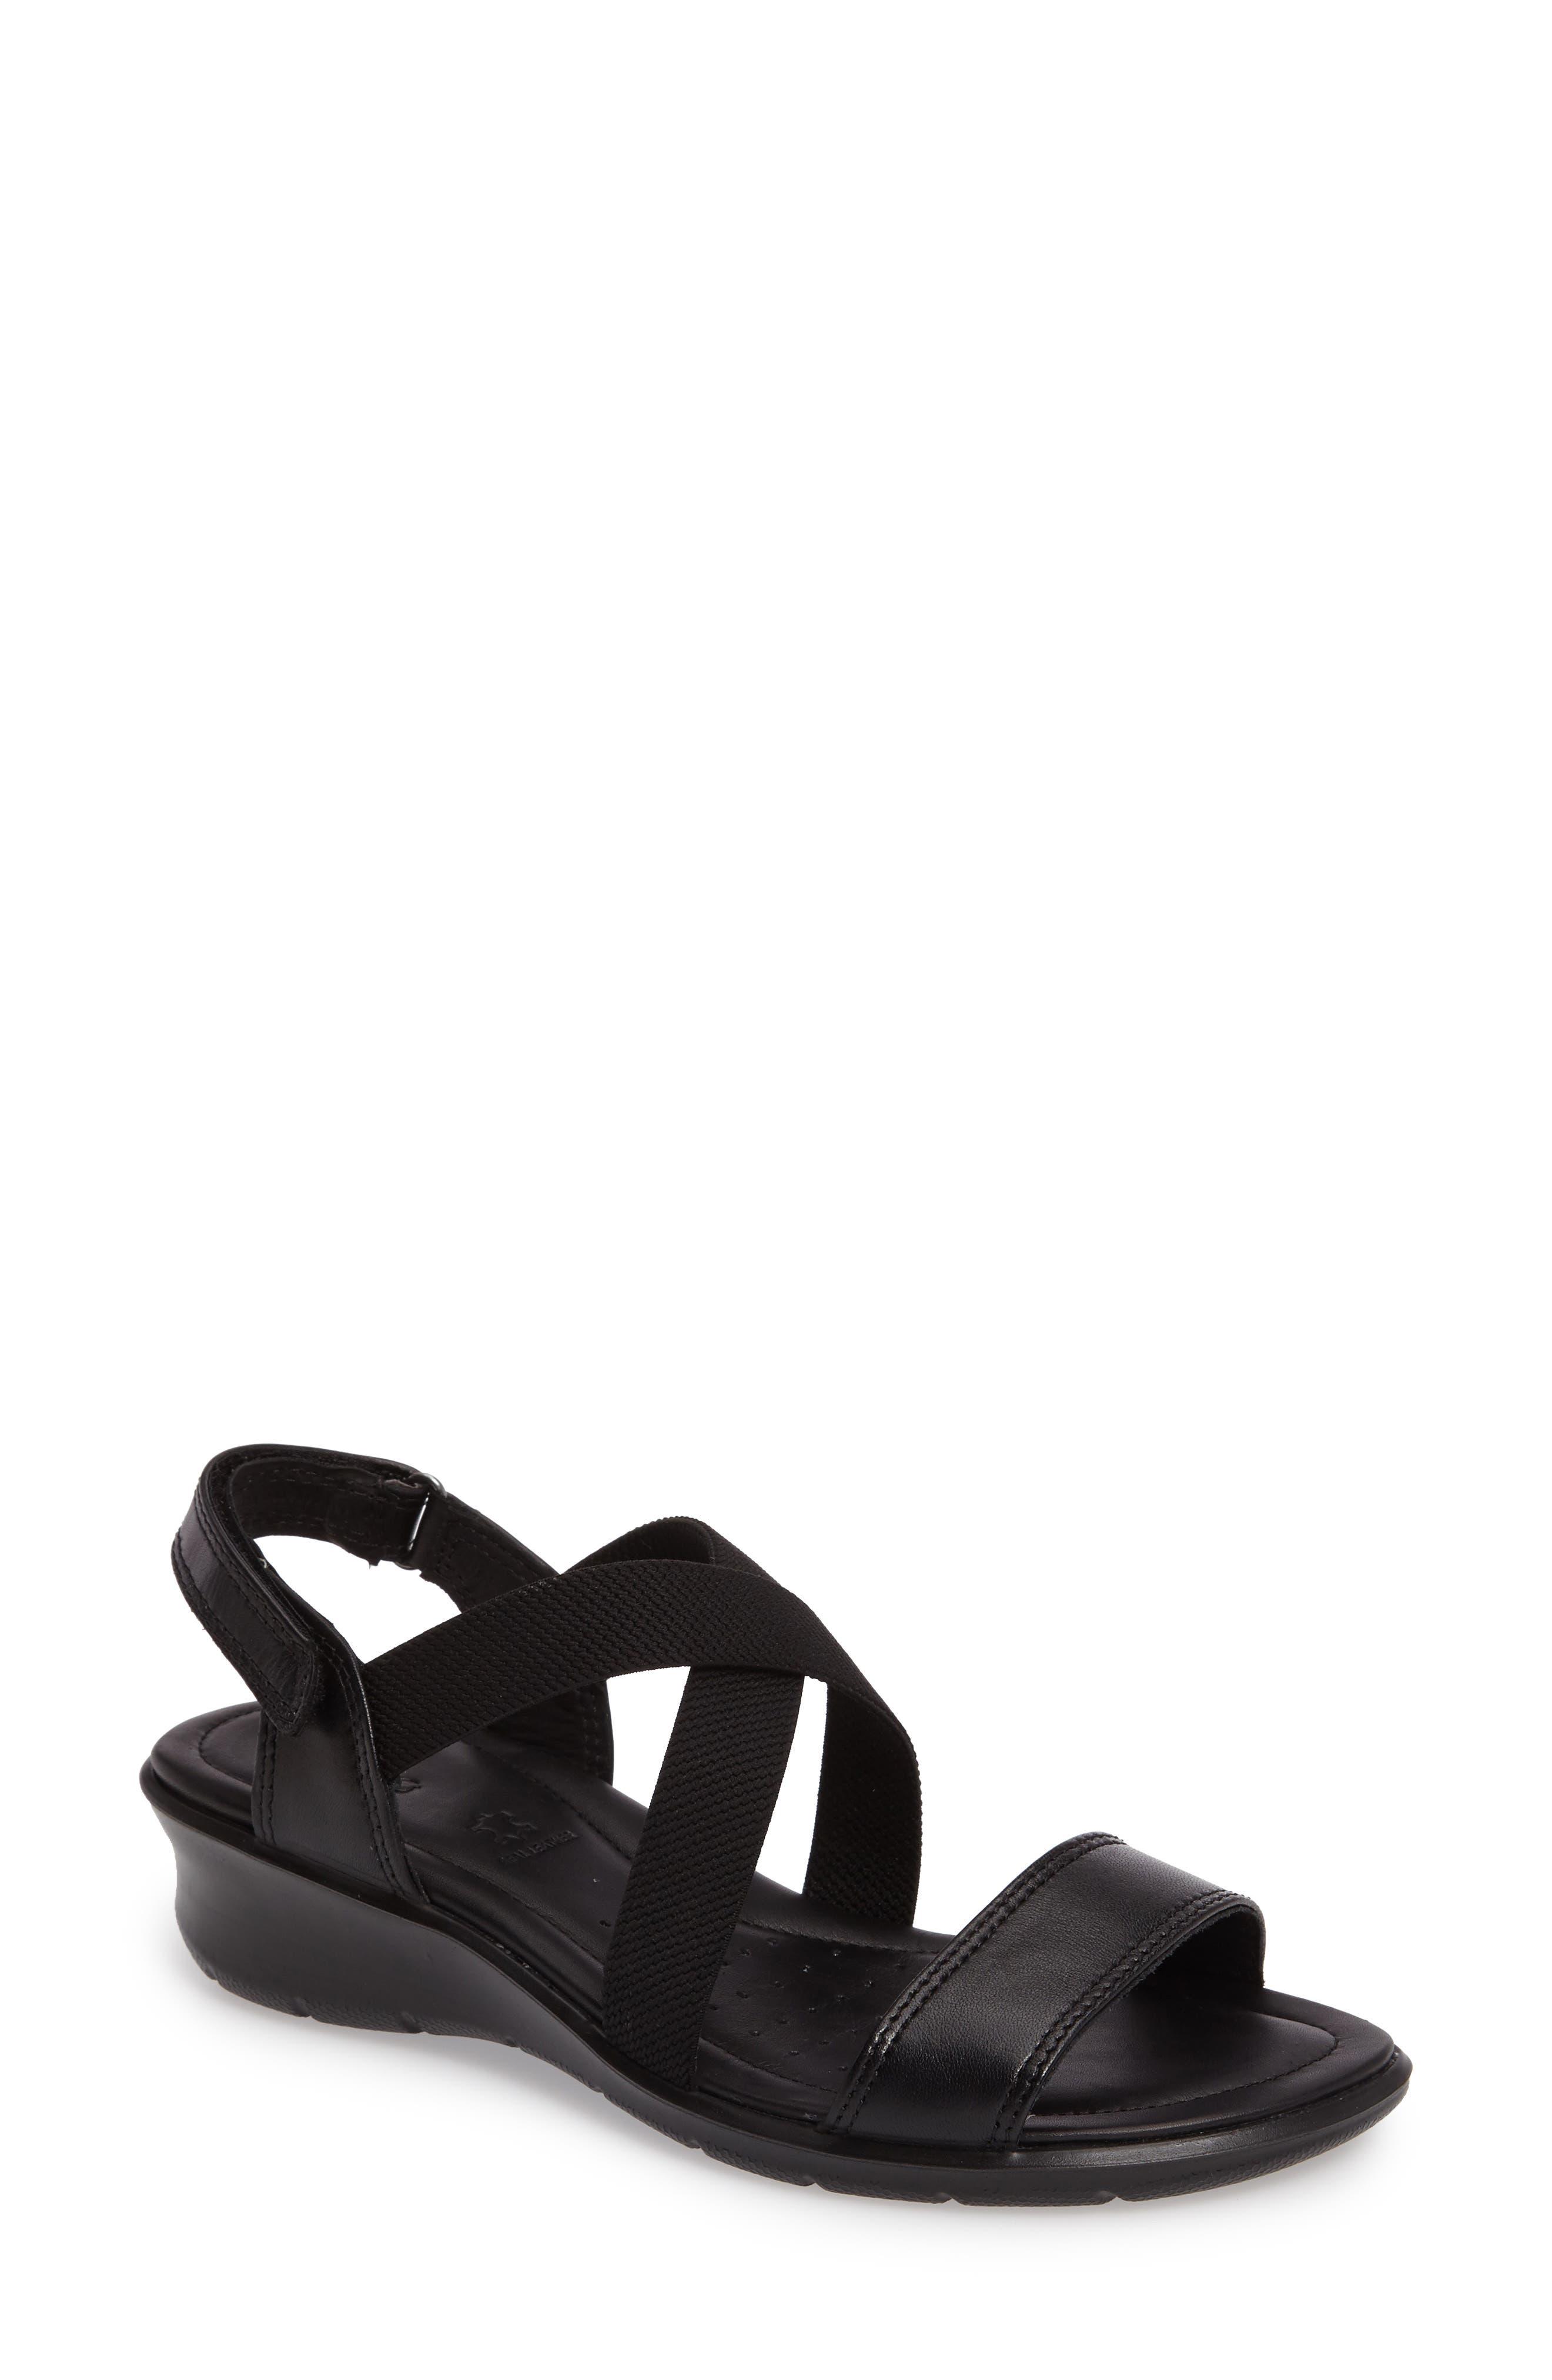 Felicia Sandal,                         Main,                         color, Black Leather